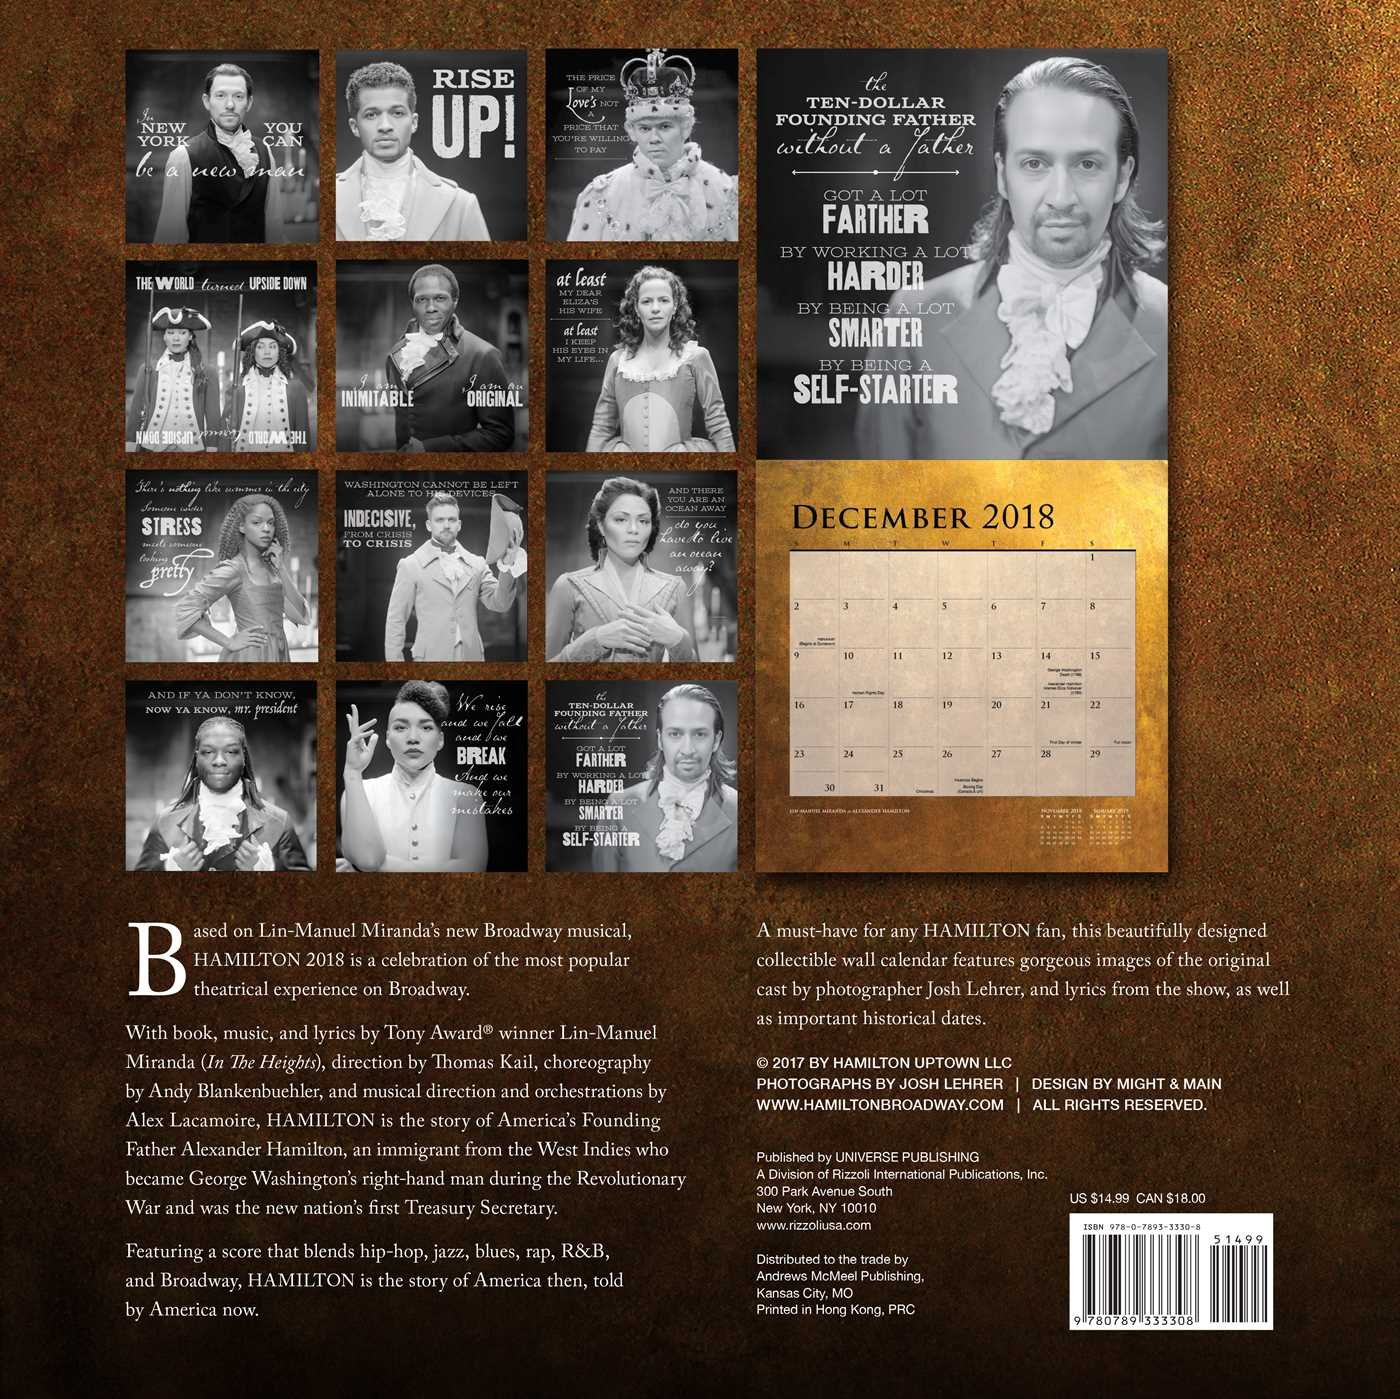 hamilton 2018 wall calendar hamilton uptown llc 0676728033301 amazoncom books